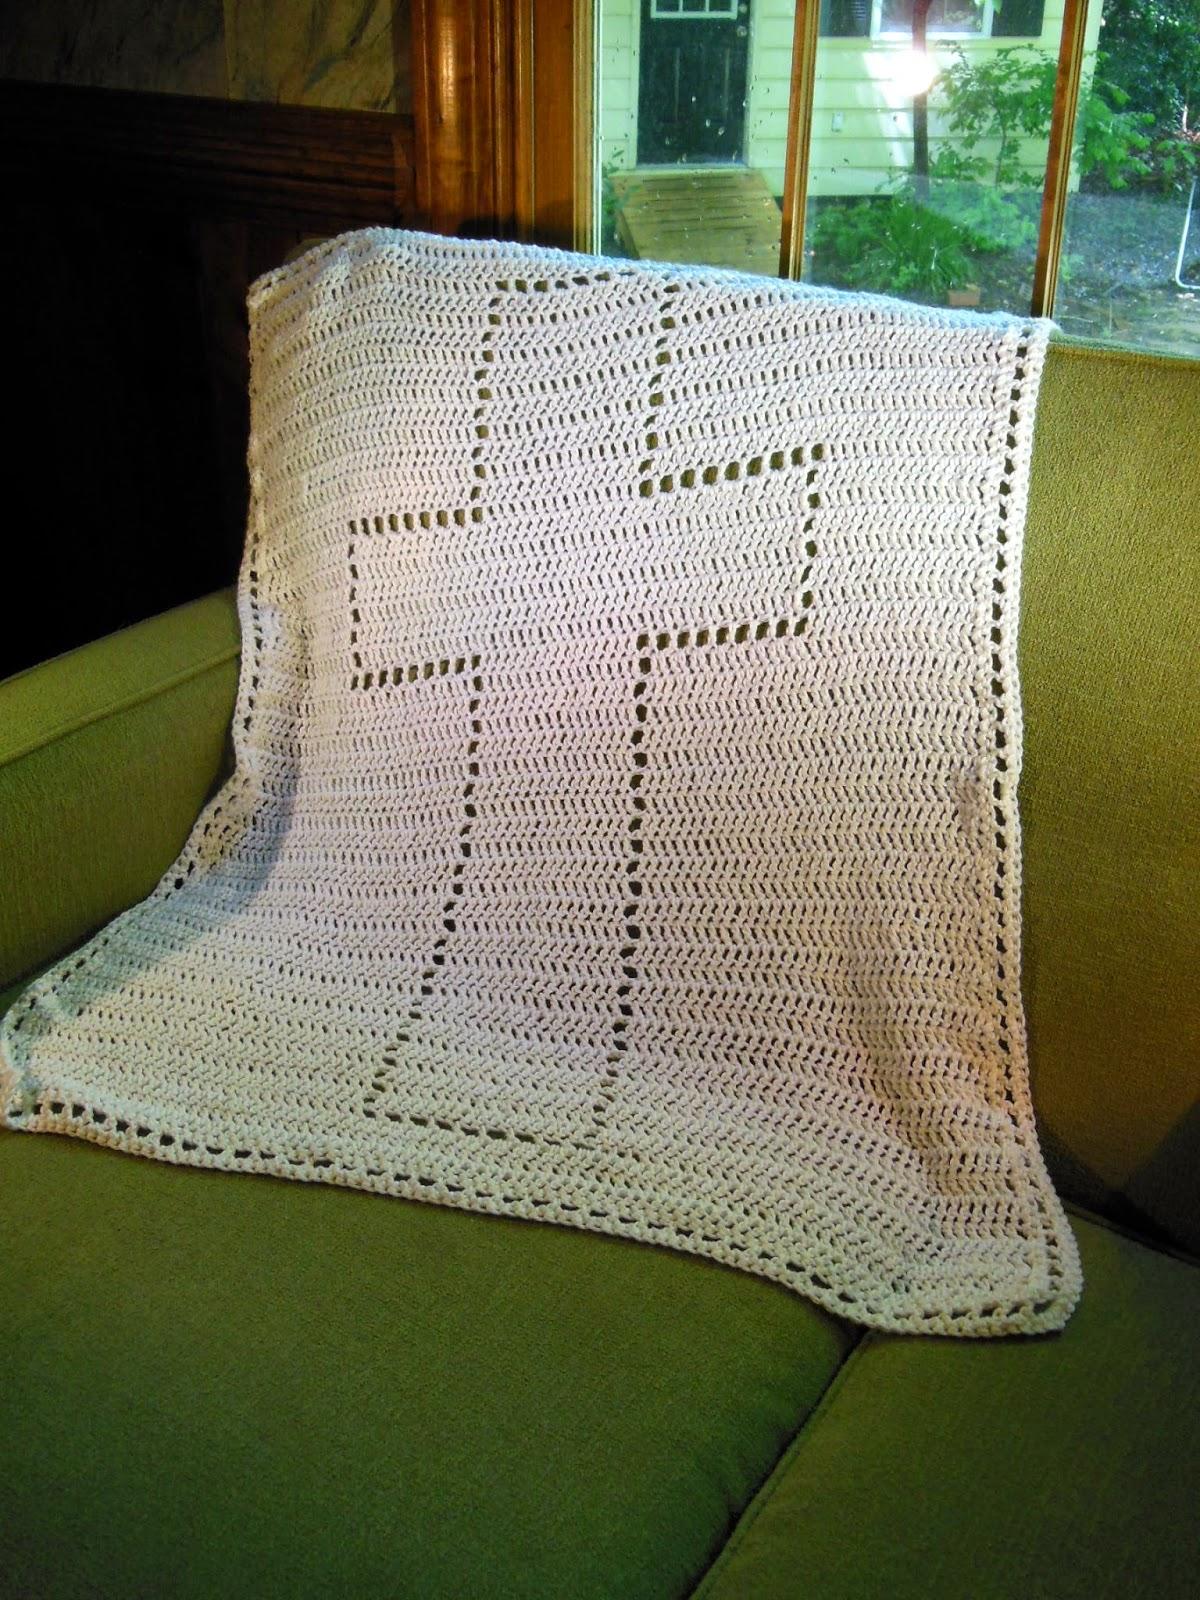 Free Knitting Patterns For Baby Christening Blankets : Hamburke: Baptism Blanket - free crochet pattern